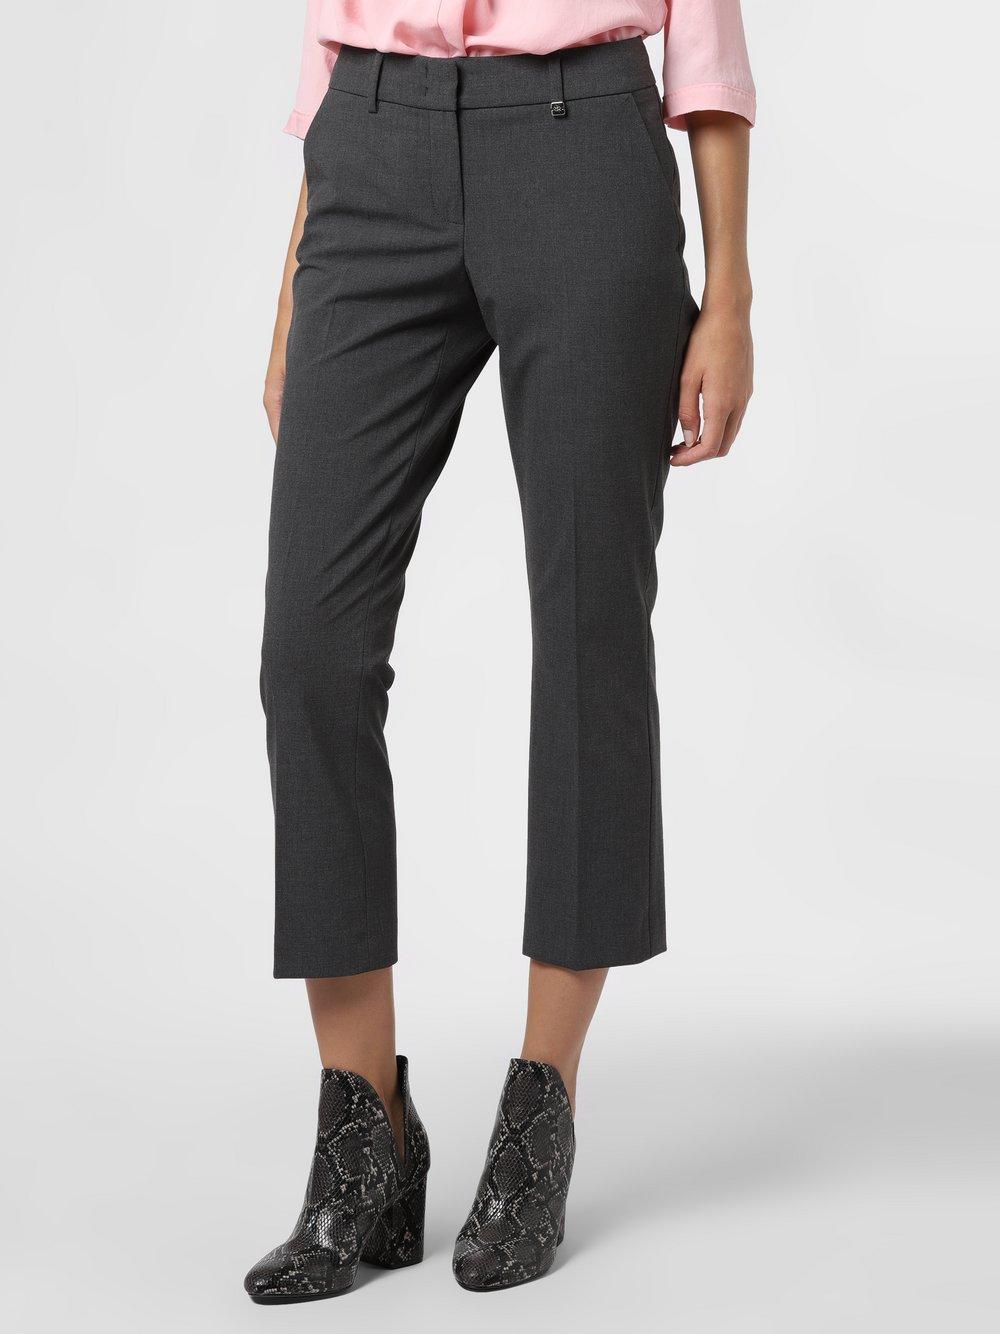 RAFFAELLO ROSSI – Spodnie damskie – Dora Cropped, szary Van Graaf 483910-0001-00420